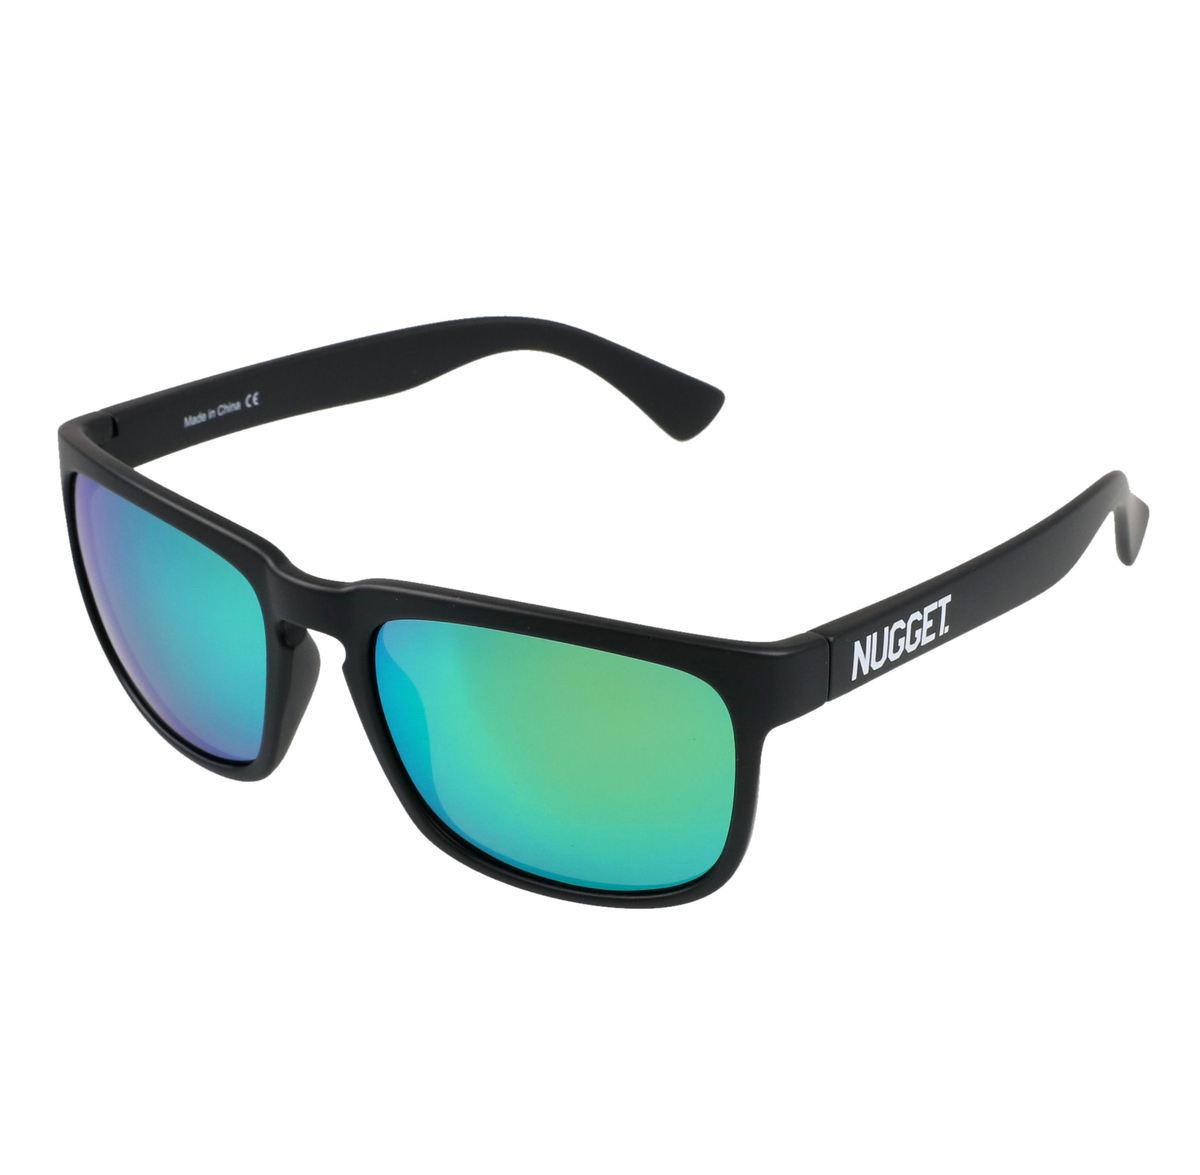 okuliare slnečné NUGGET - CLONE D 4/17/38 - BLACK GREEN - MEAT127